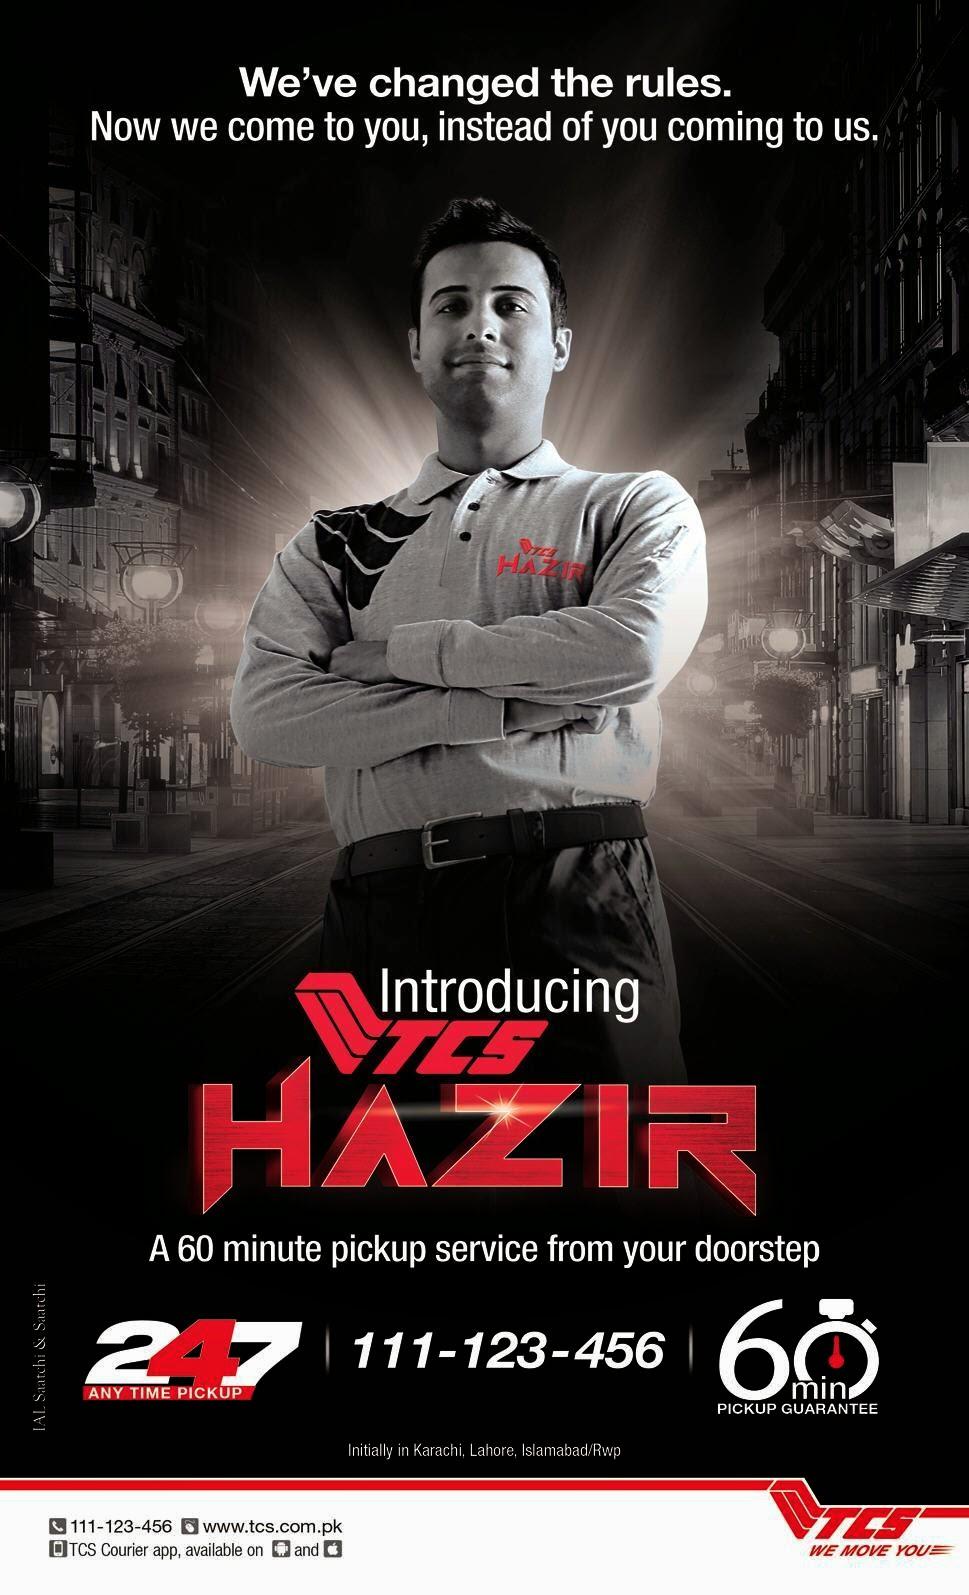 TCS Pakistan HAZIR | 60 min Pickup Guarantee